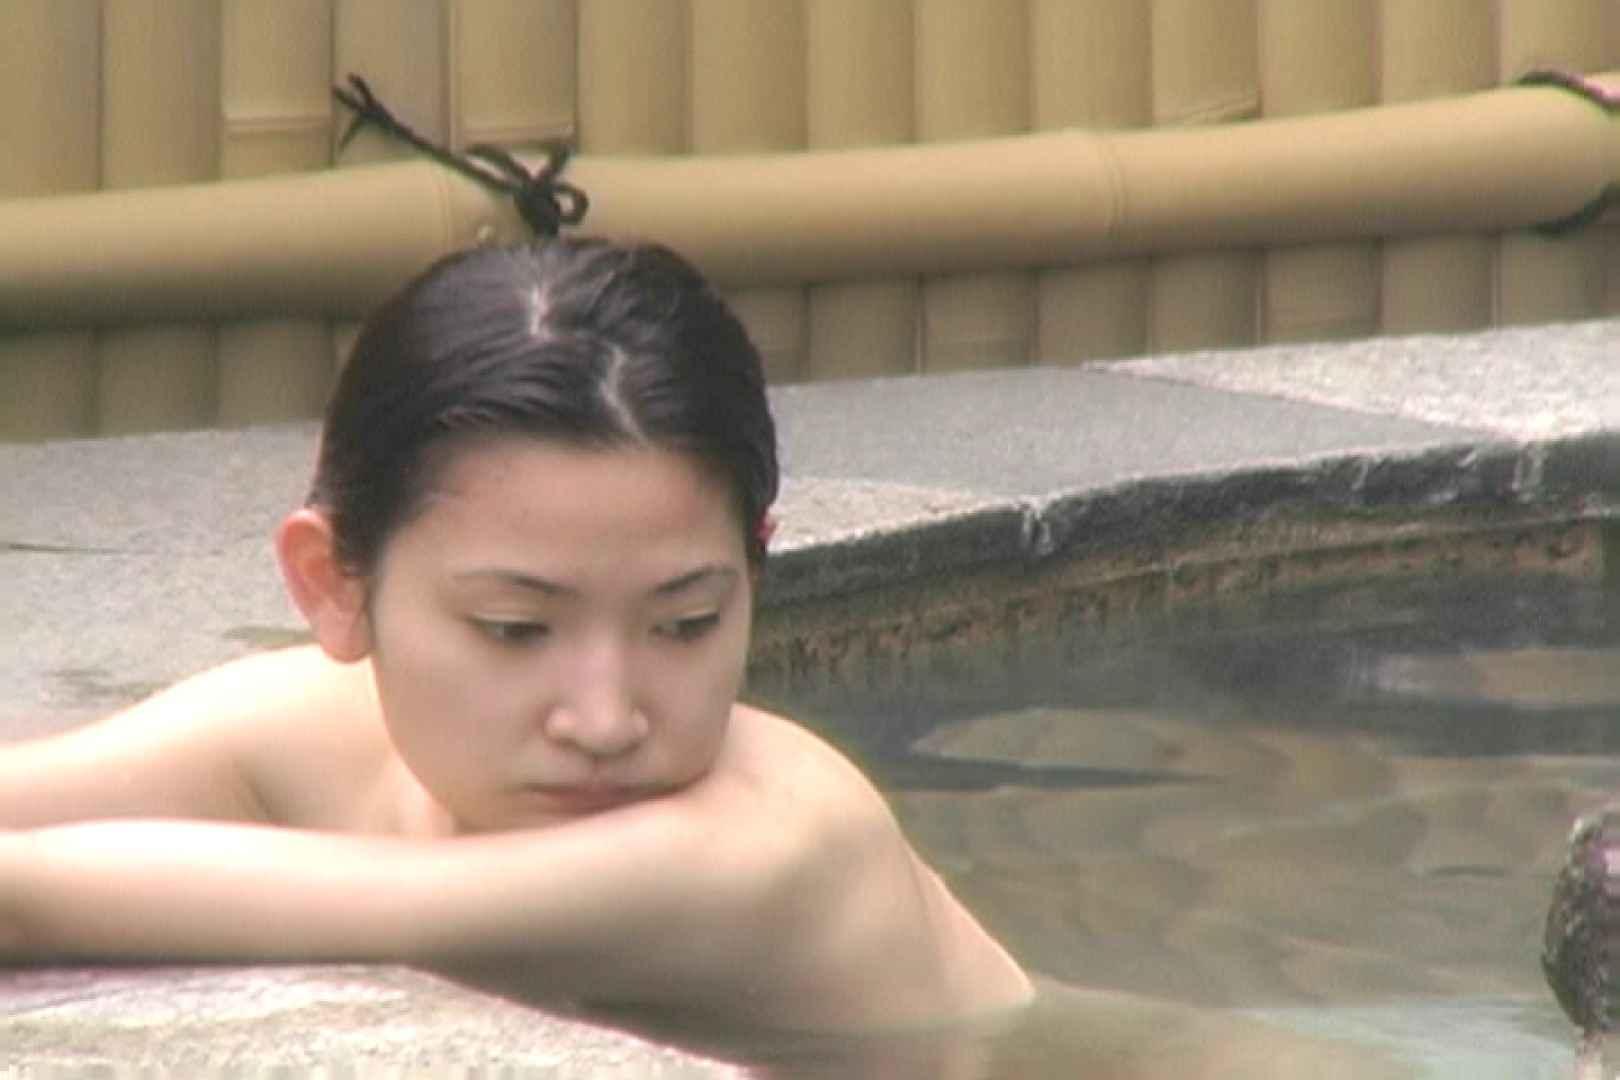 Aquaな露天風呂Vol.637 露天風呂突入 すけべAV動画紹介 81pic 59